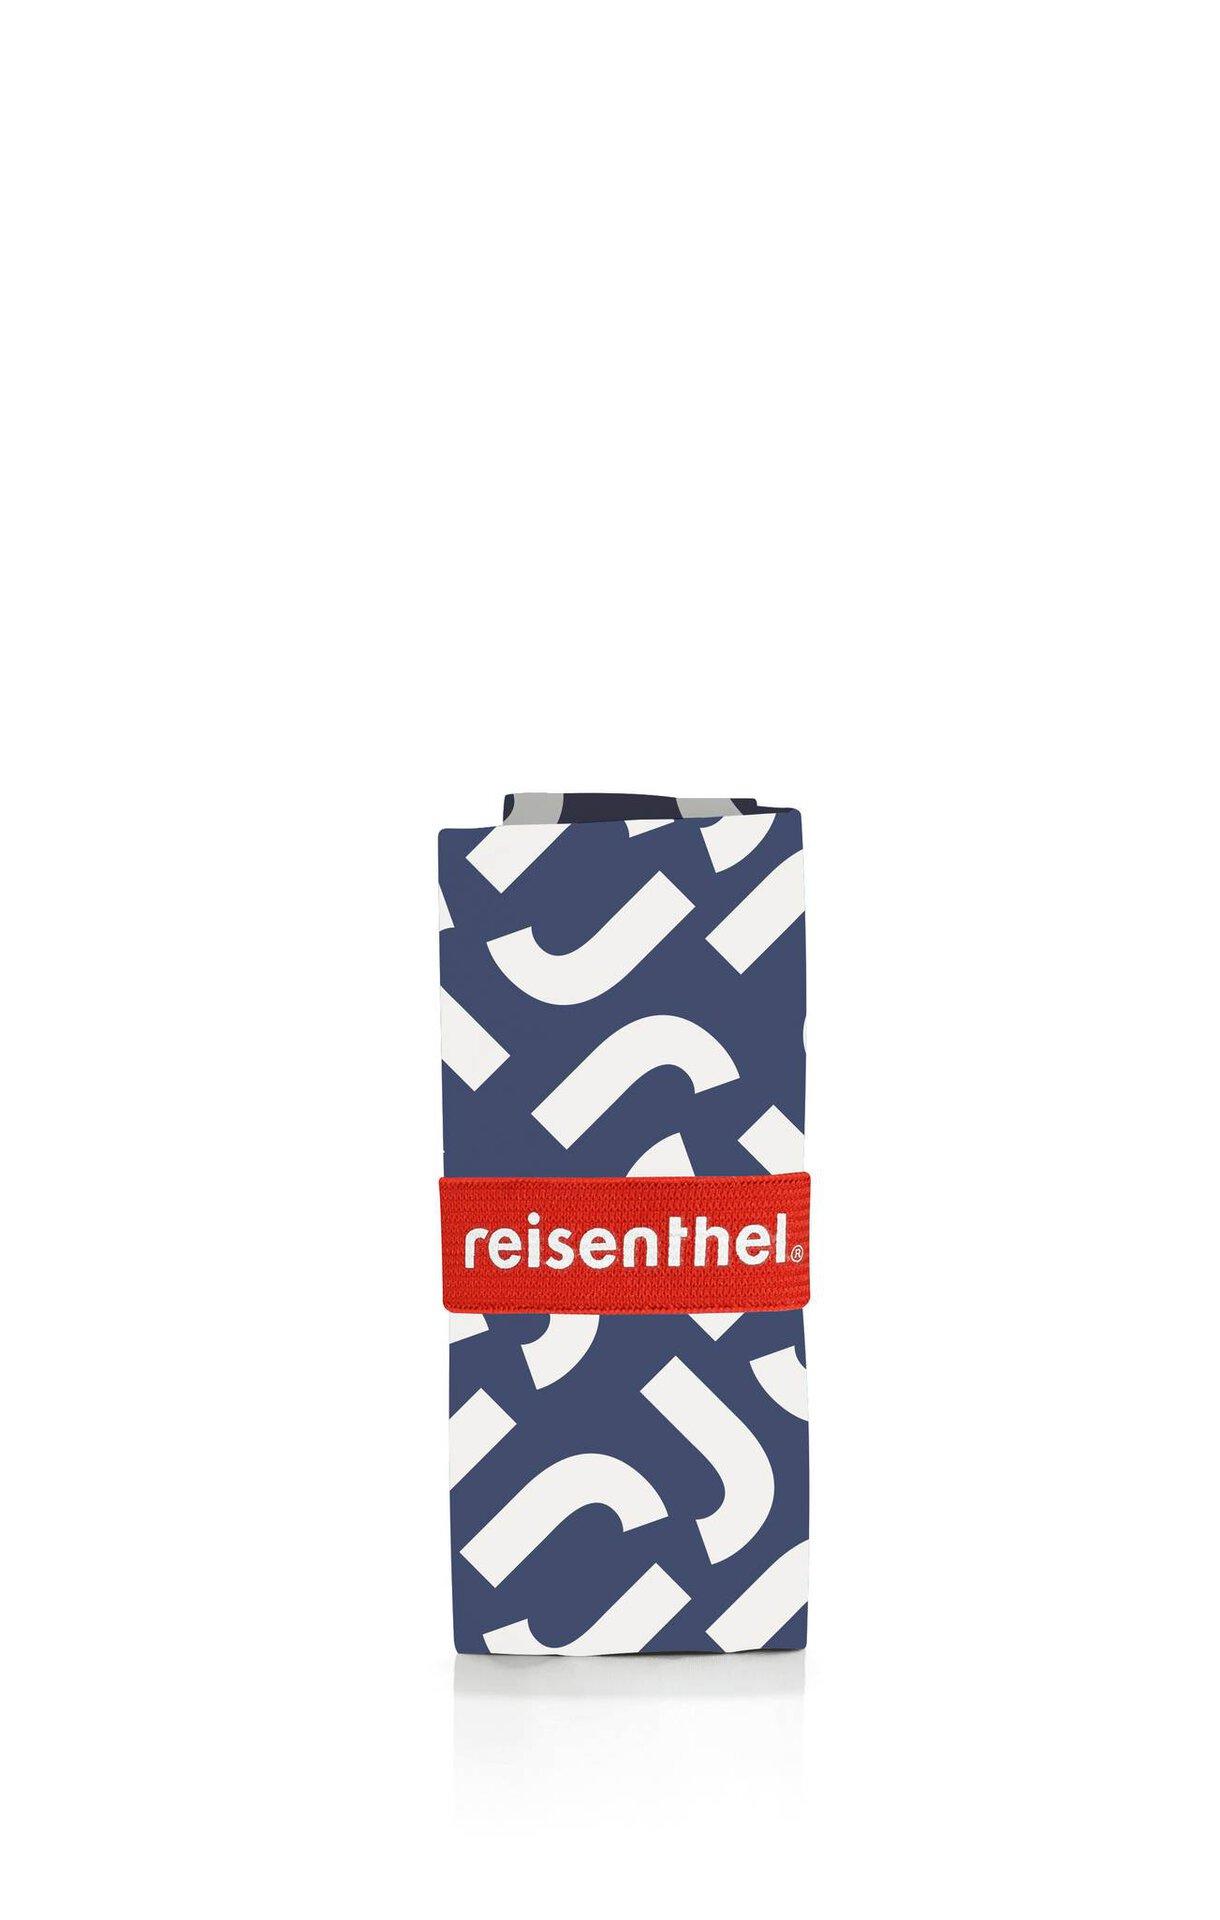 Tasche mini maxi shopper Reisenthel Textil 43 x 63 x